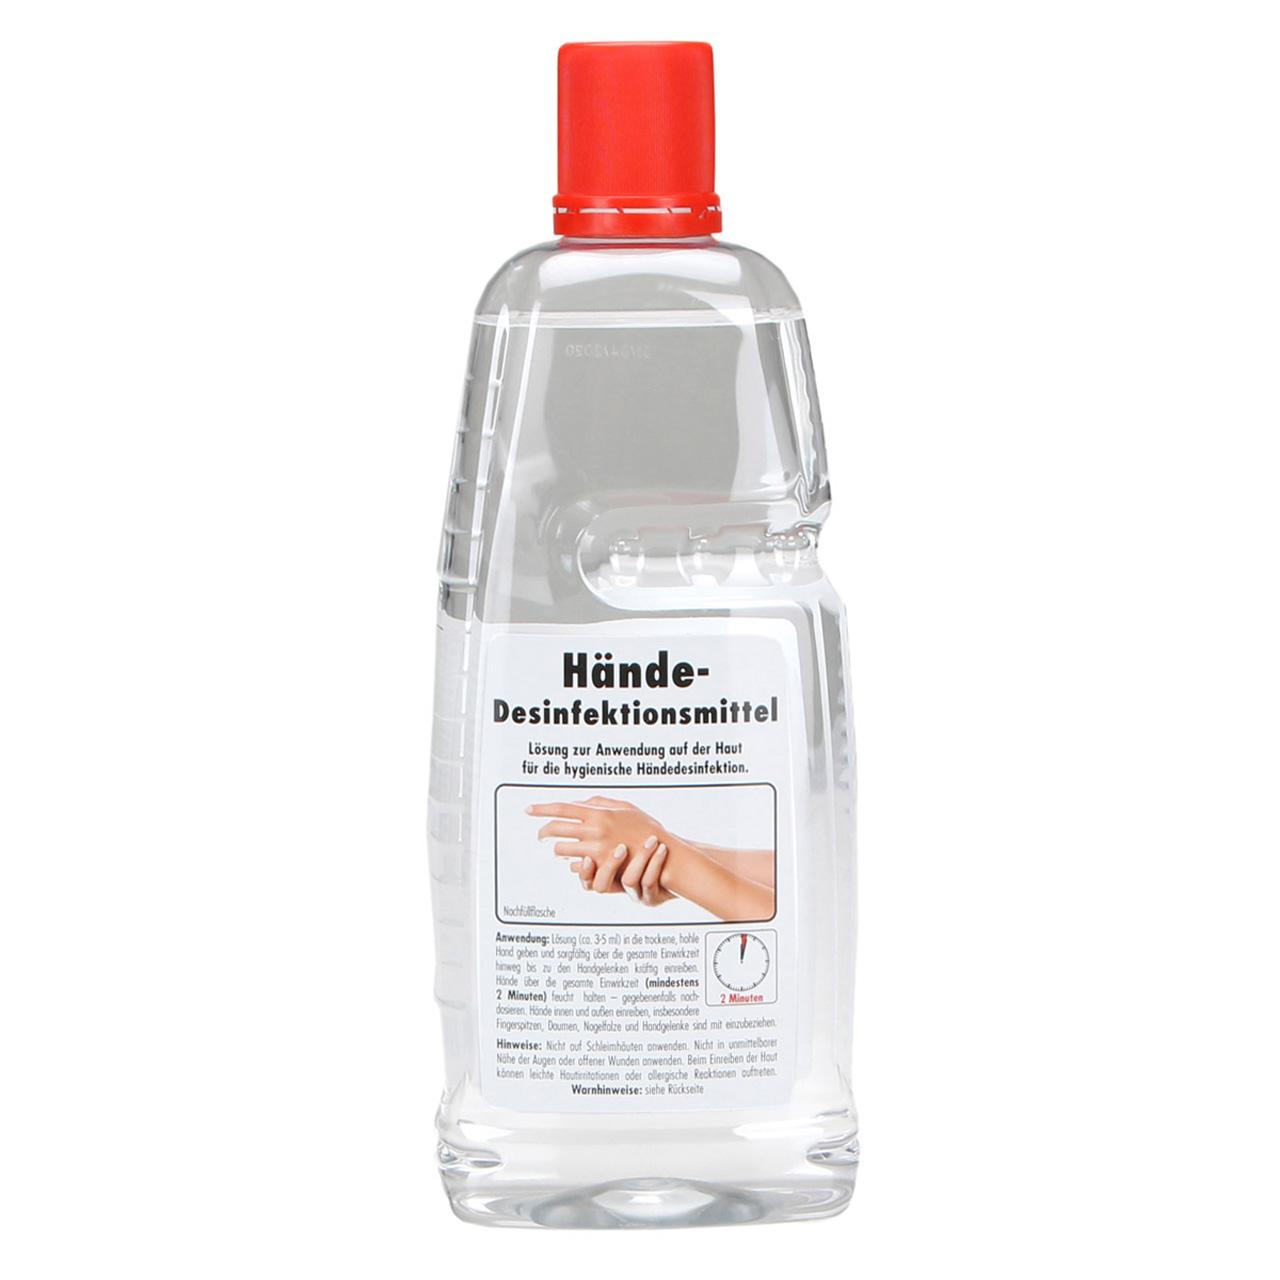 SONAX 401300 Desinfektionsmittel Handdesinfektionsmittel nach WHO 1 Liter